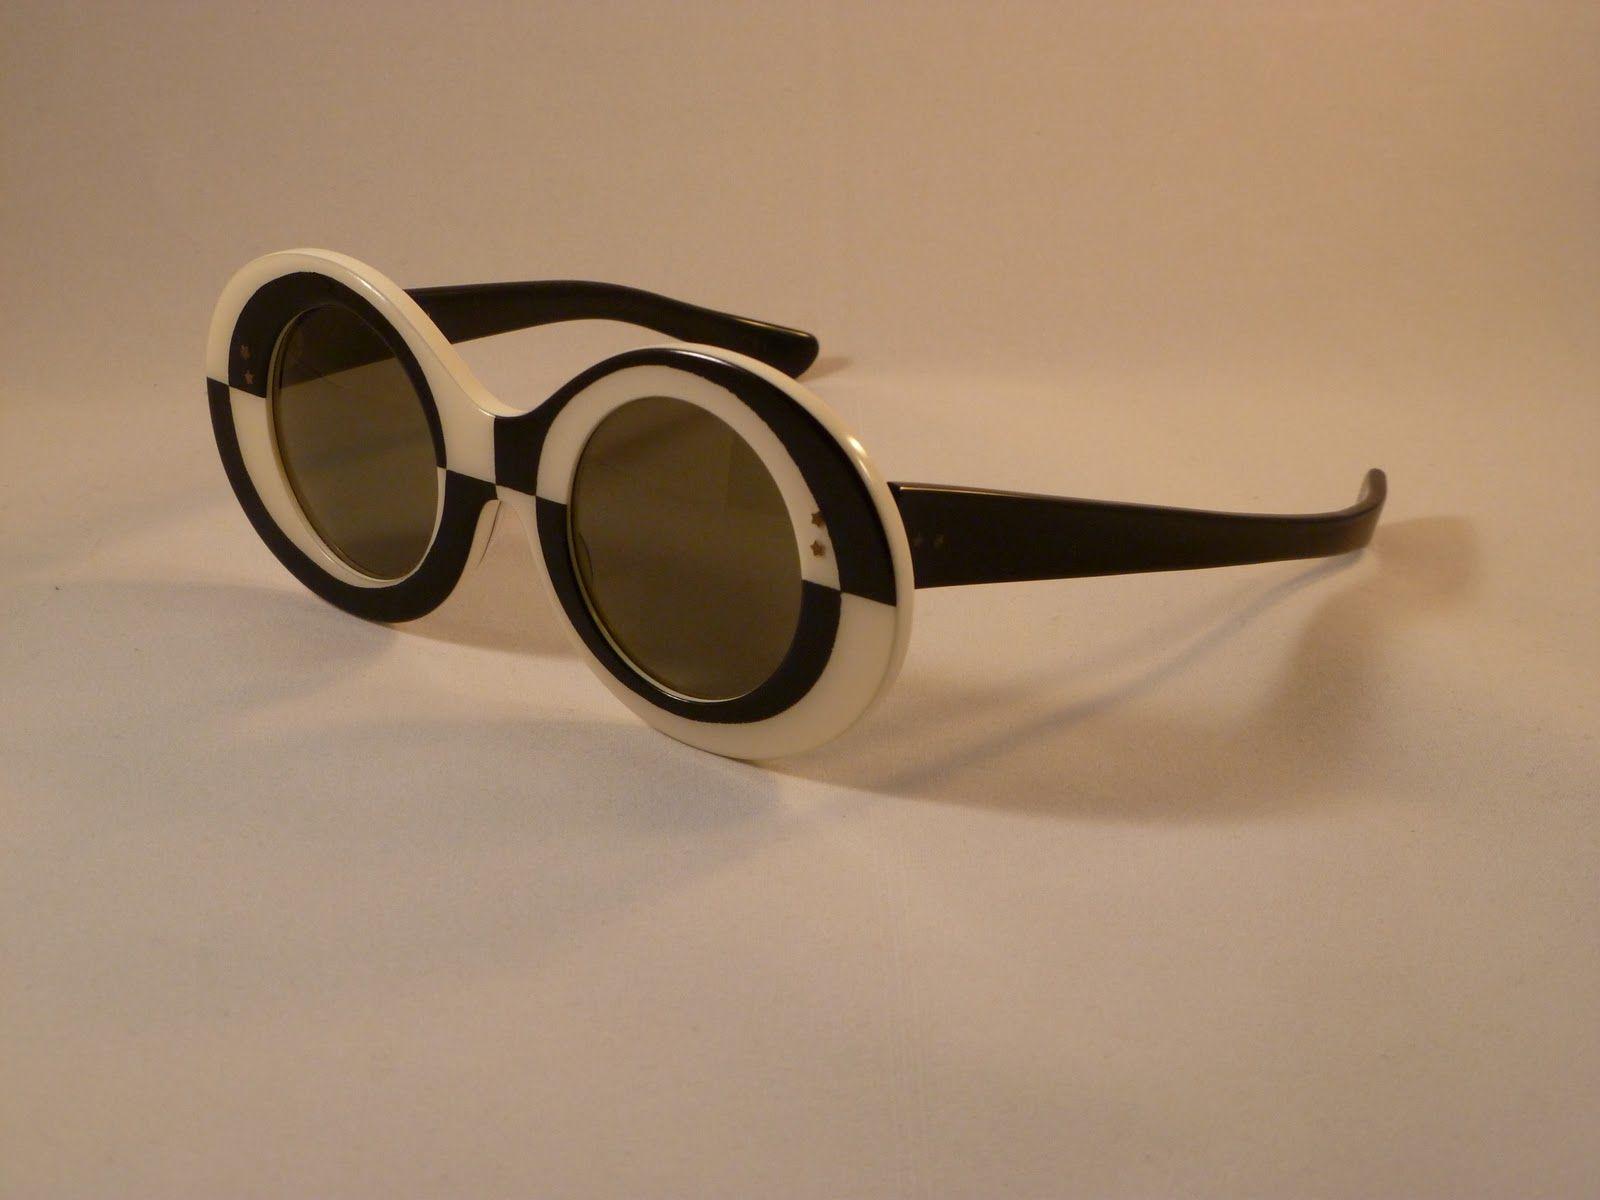 525891af02e0 moss lipow sunglasses - Google Search